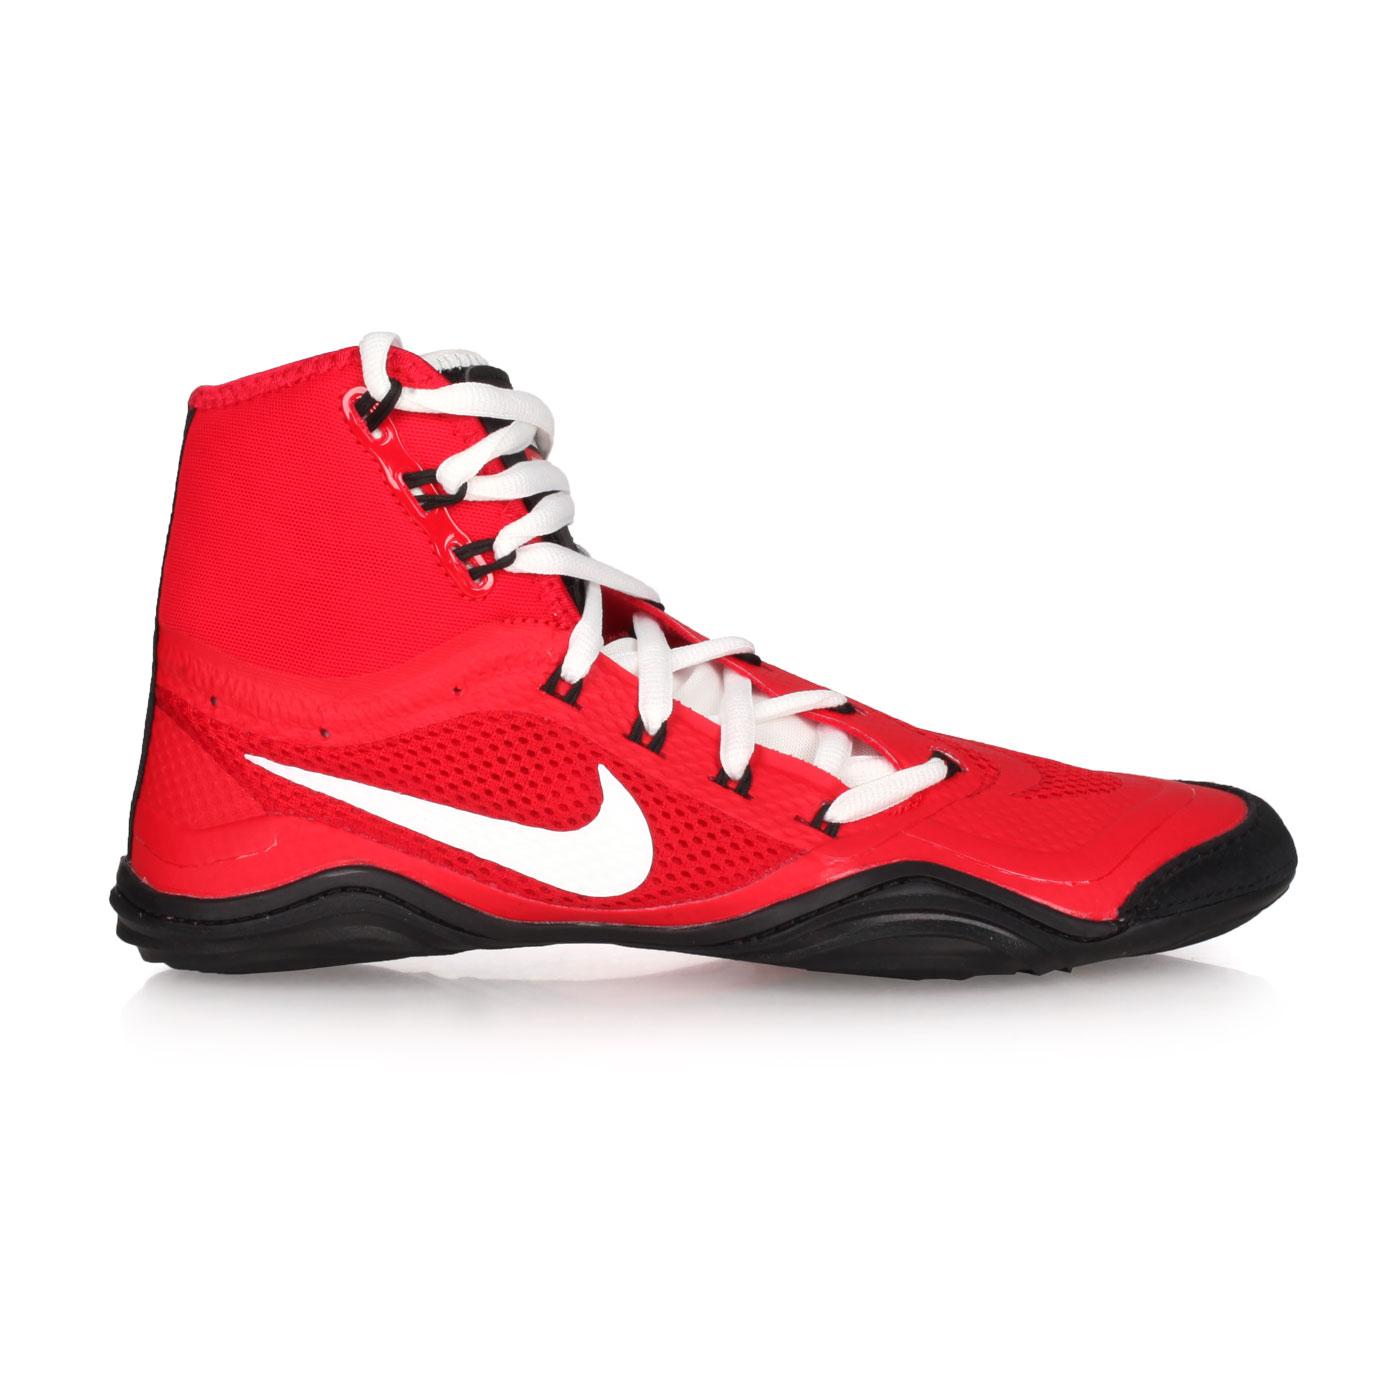 NIKE 限量-角力鞋  @HYPERSWEEP@717175610